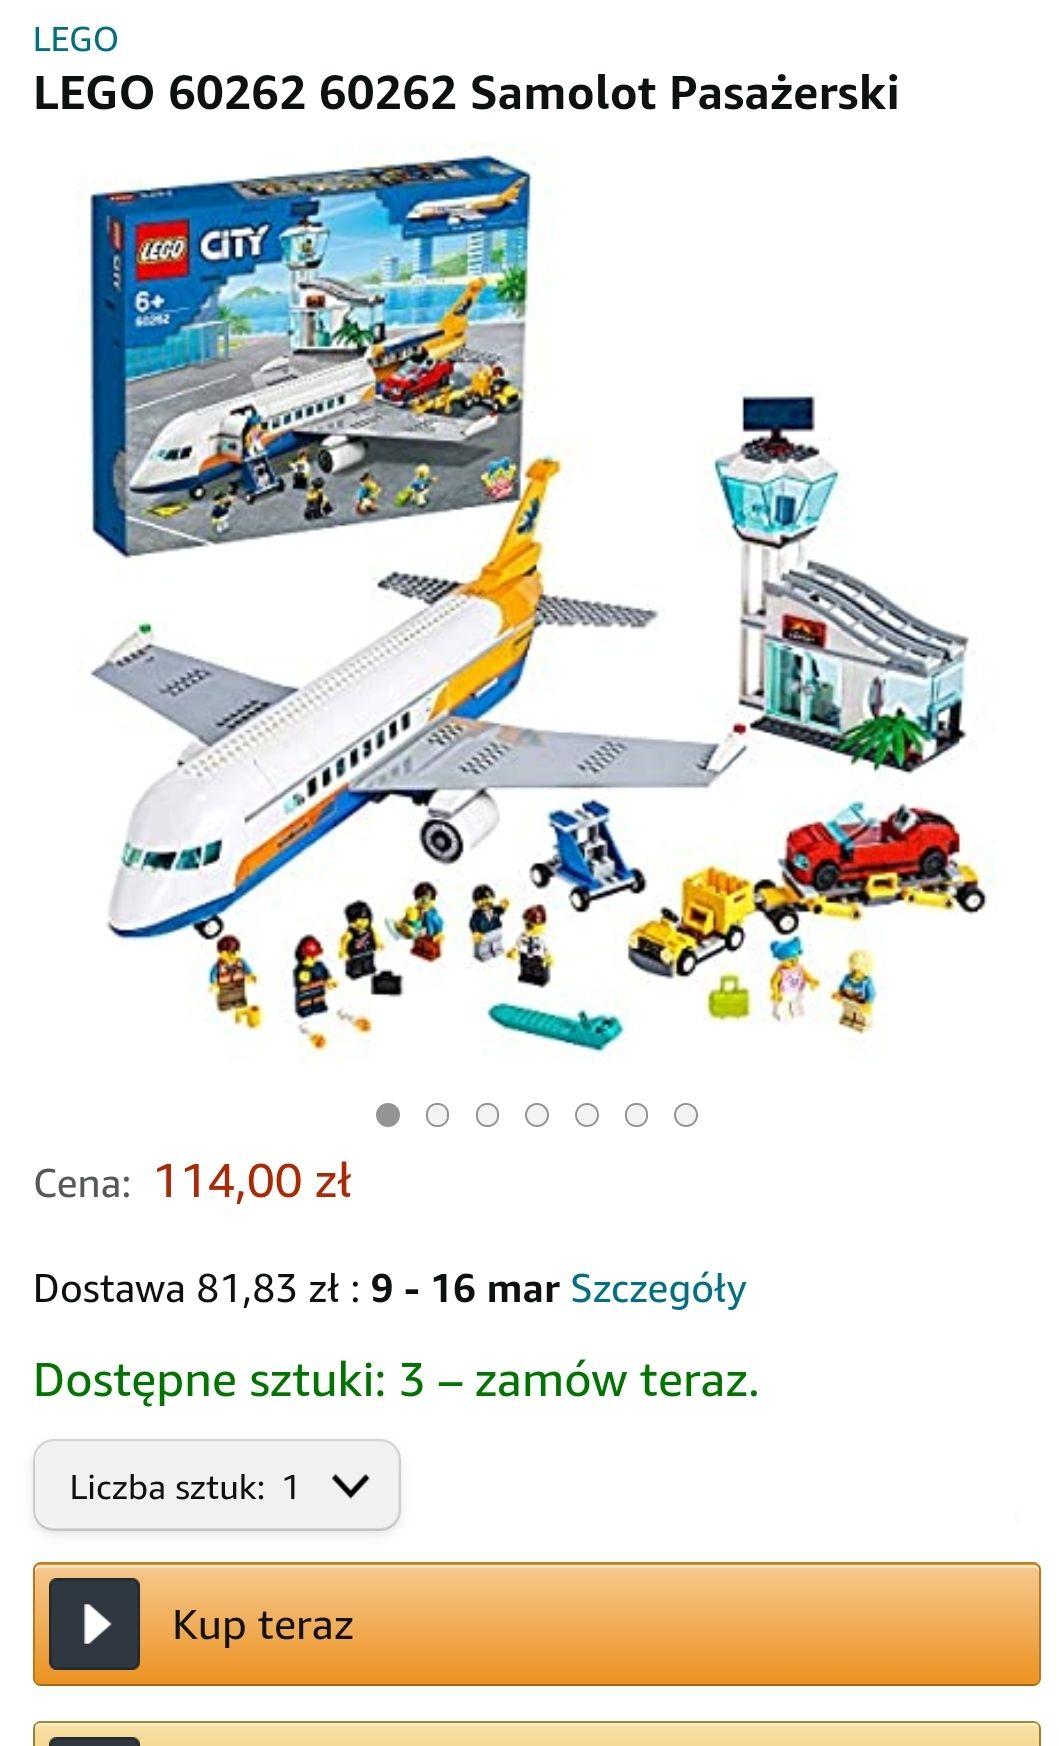 Lego samolot pasażerski 60262